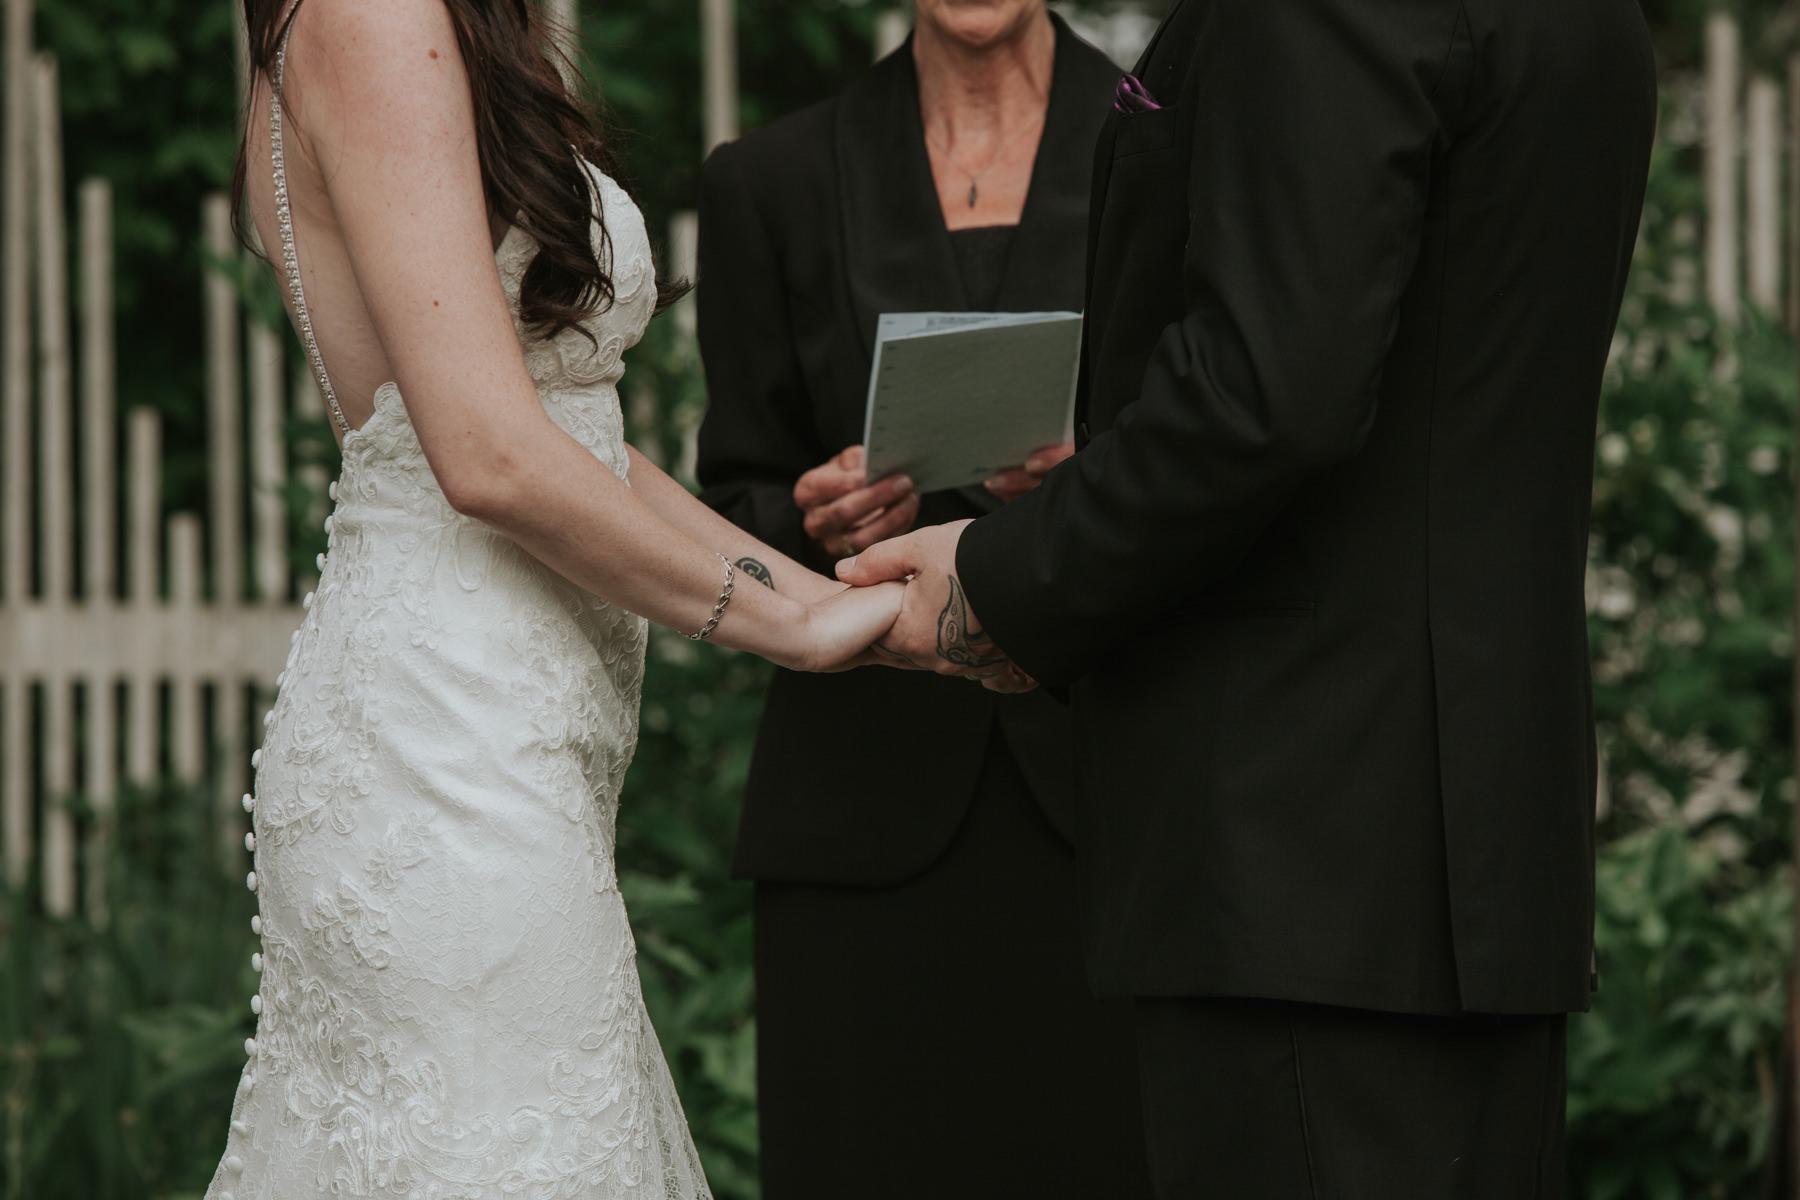 Vancouver Wedding Photographer Pam (27).jpg